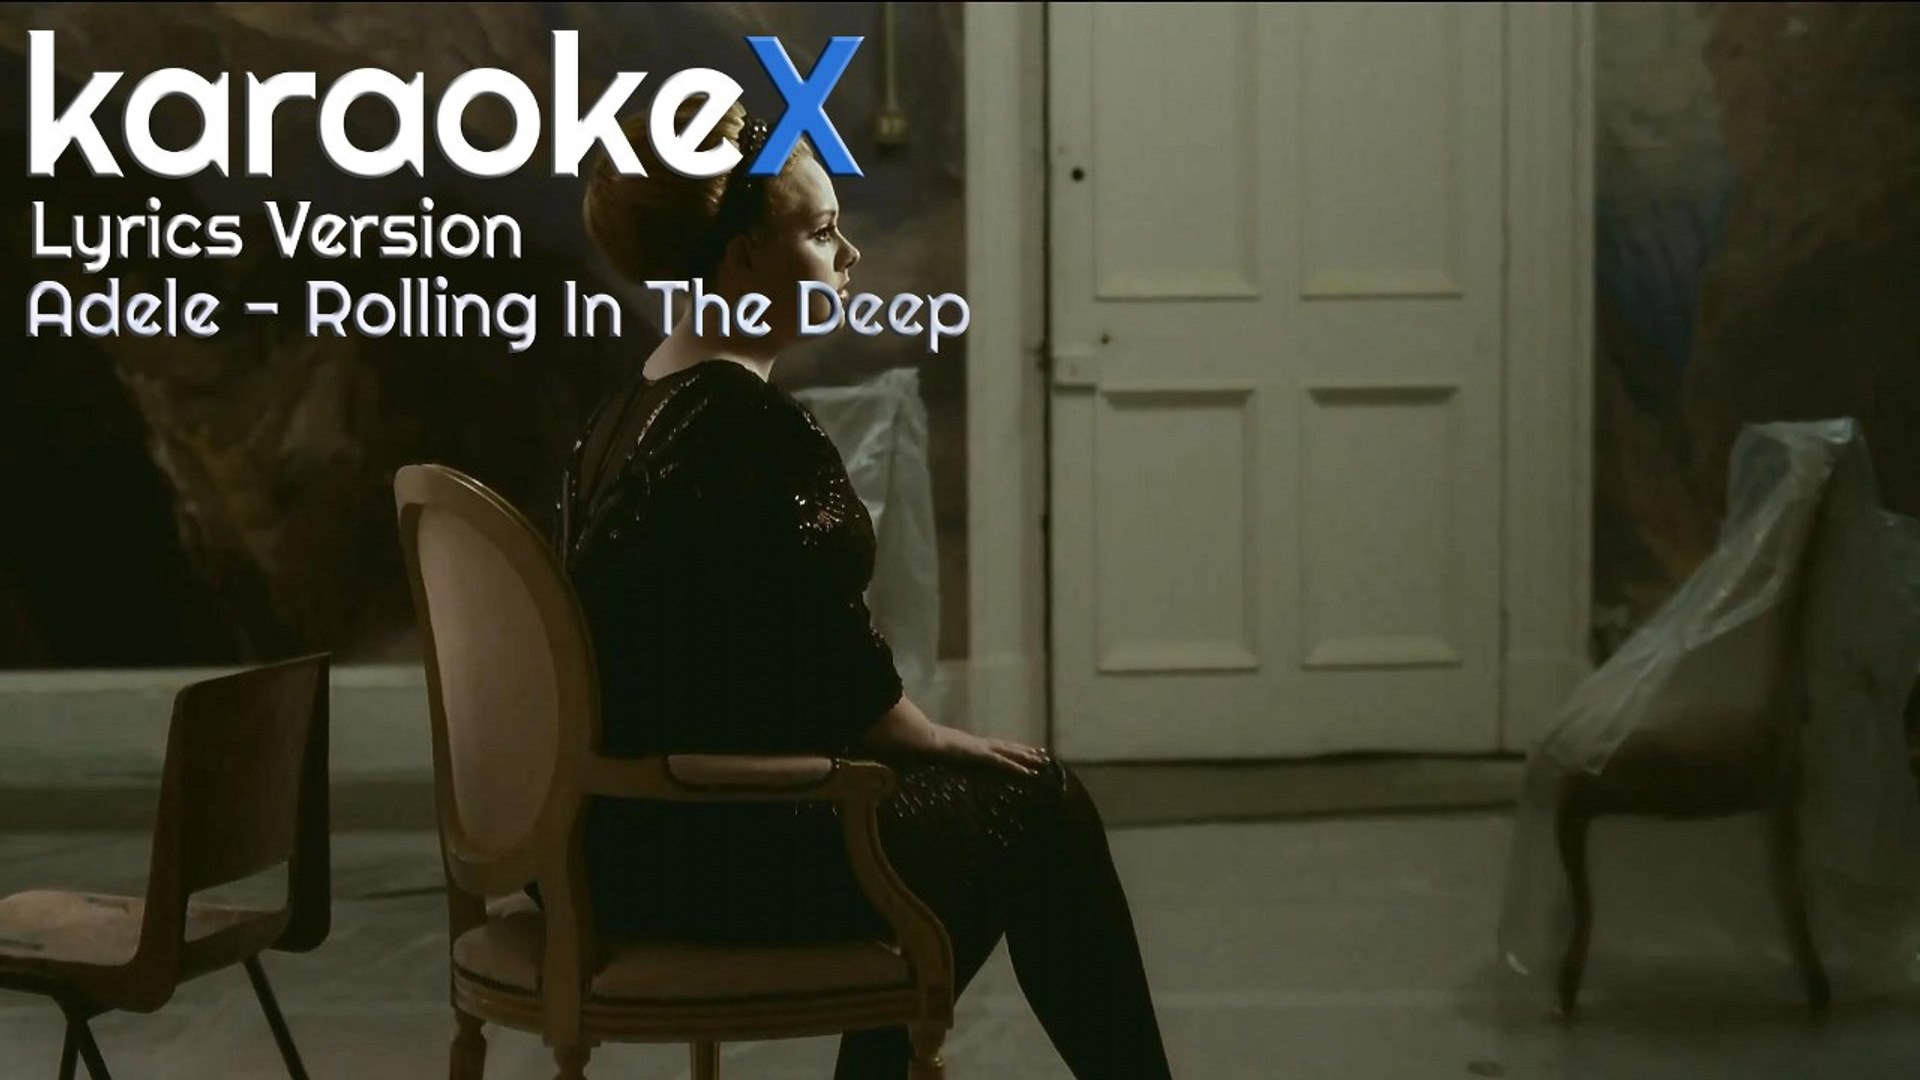 Adele - Rolling In The Deep Lyrics Version (KaraokeX)